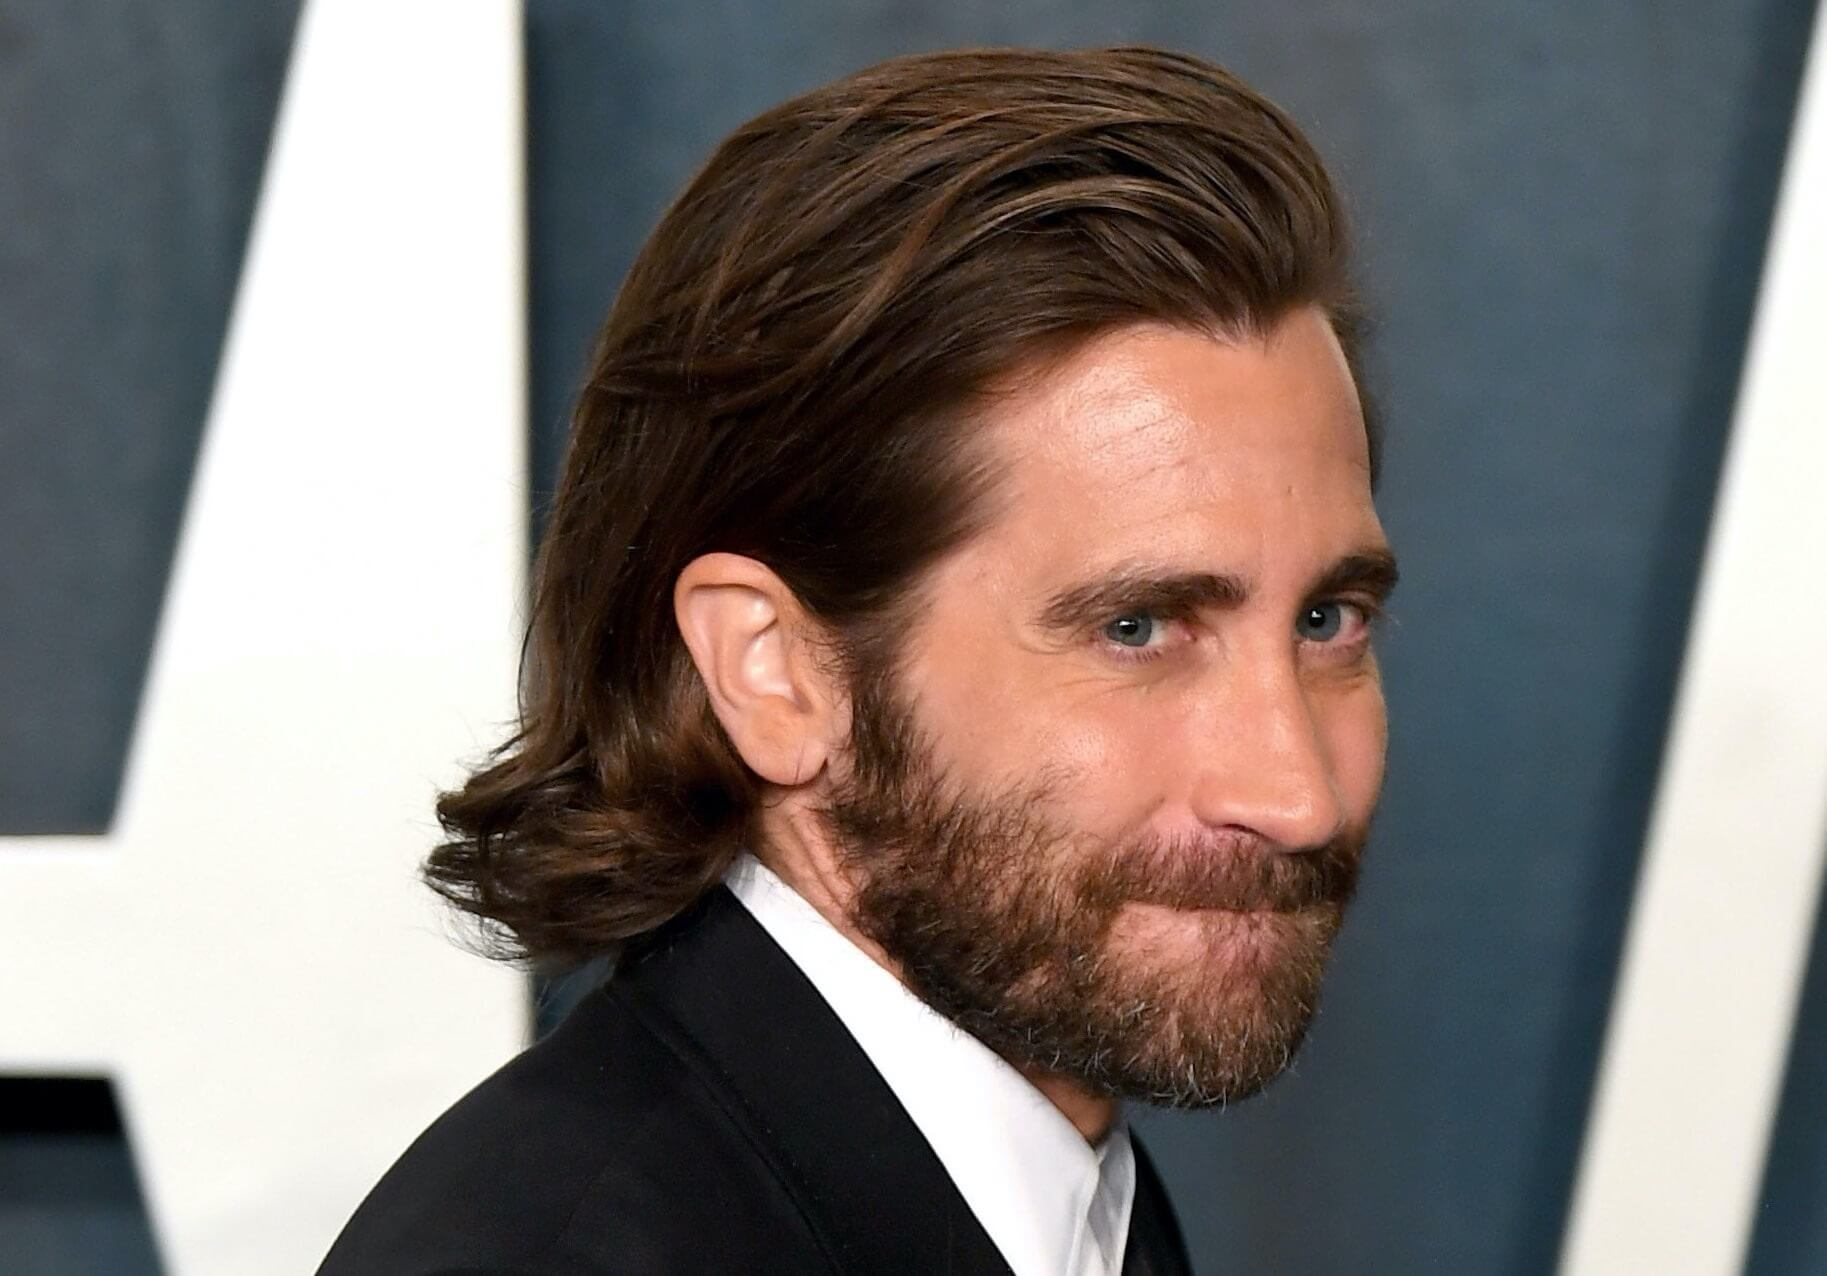 Jake Gyllenhaal capelli lunghi uomo 2021